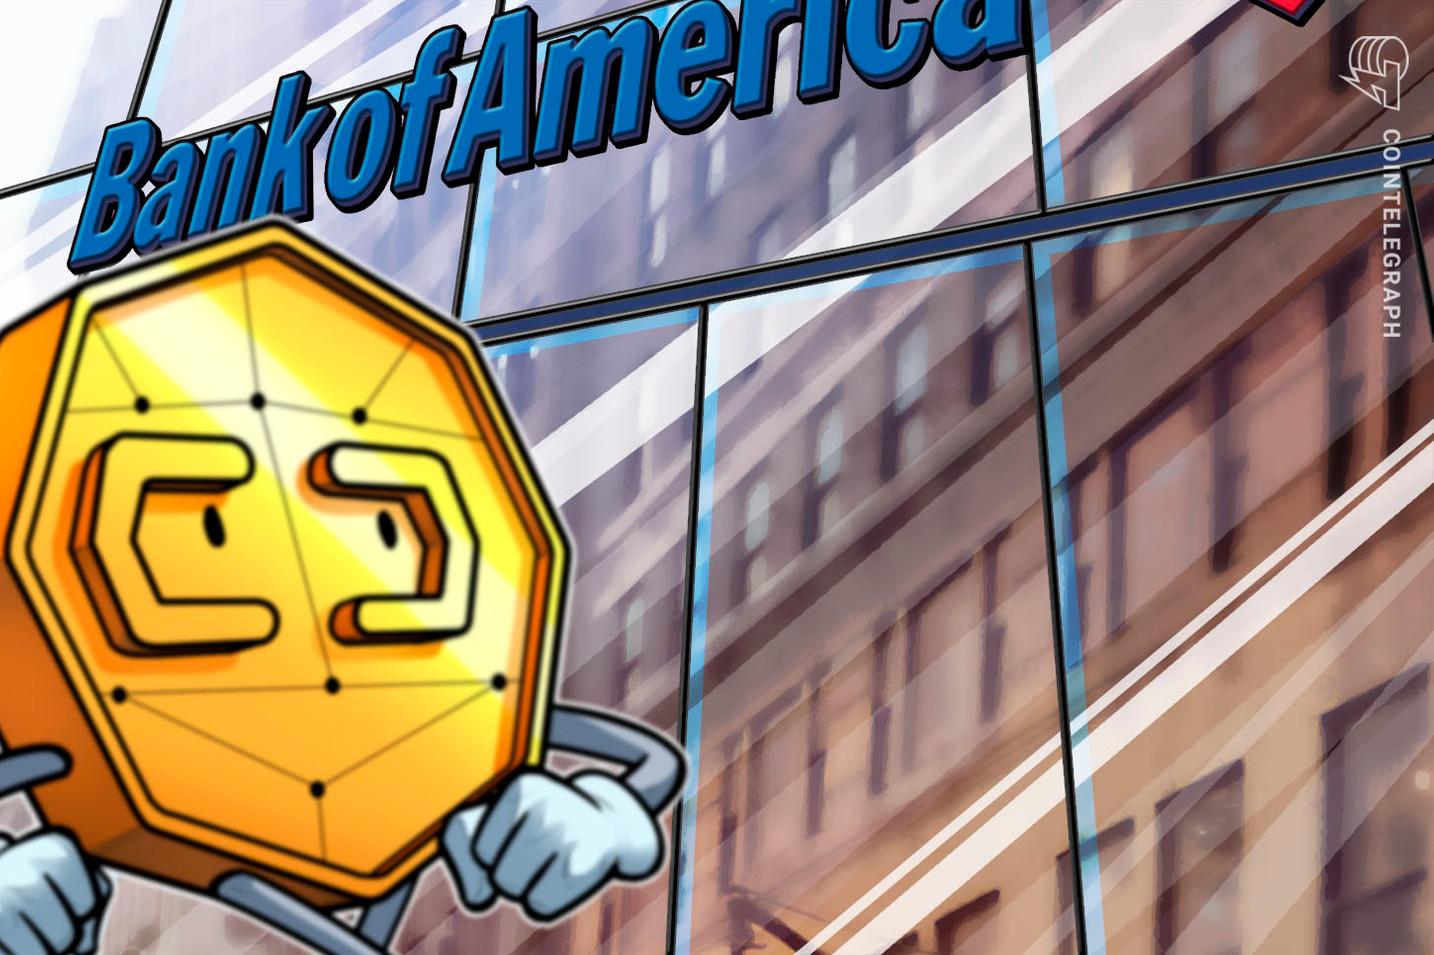 Bank of America oferece perspectiva otimista para DeFi e NFTs